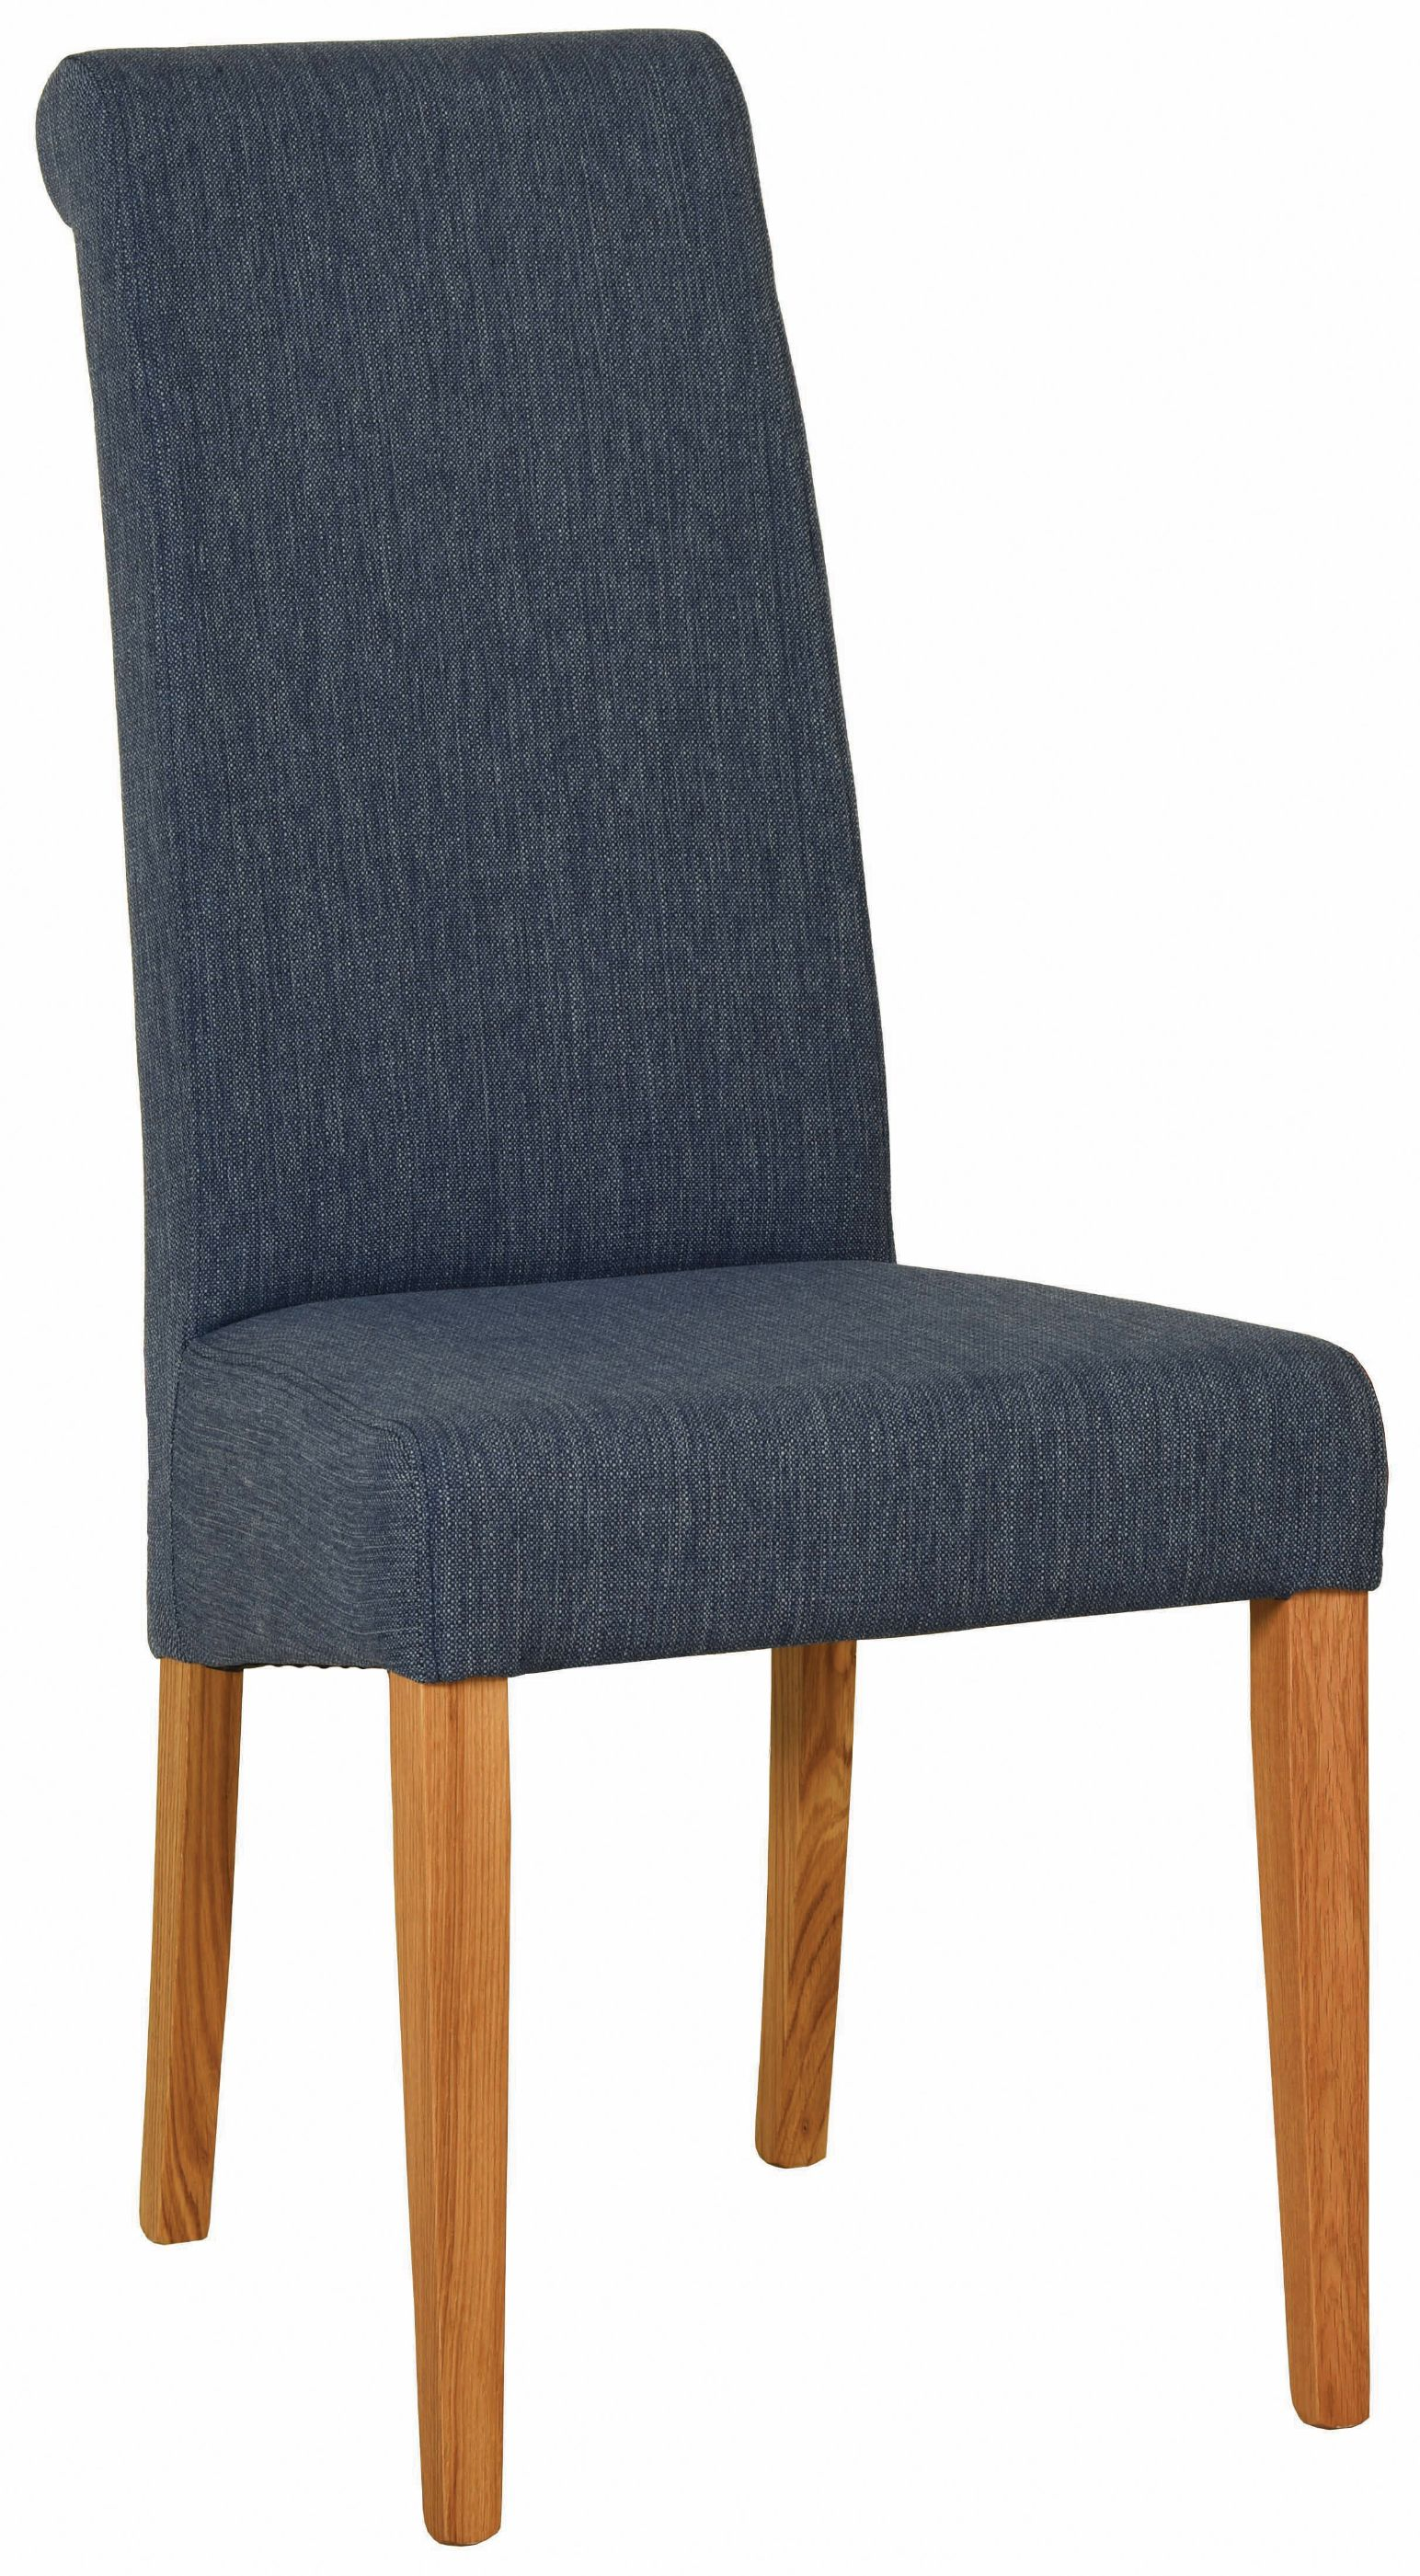 Dorchester Oak Fabric Dining Chair Blue